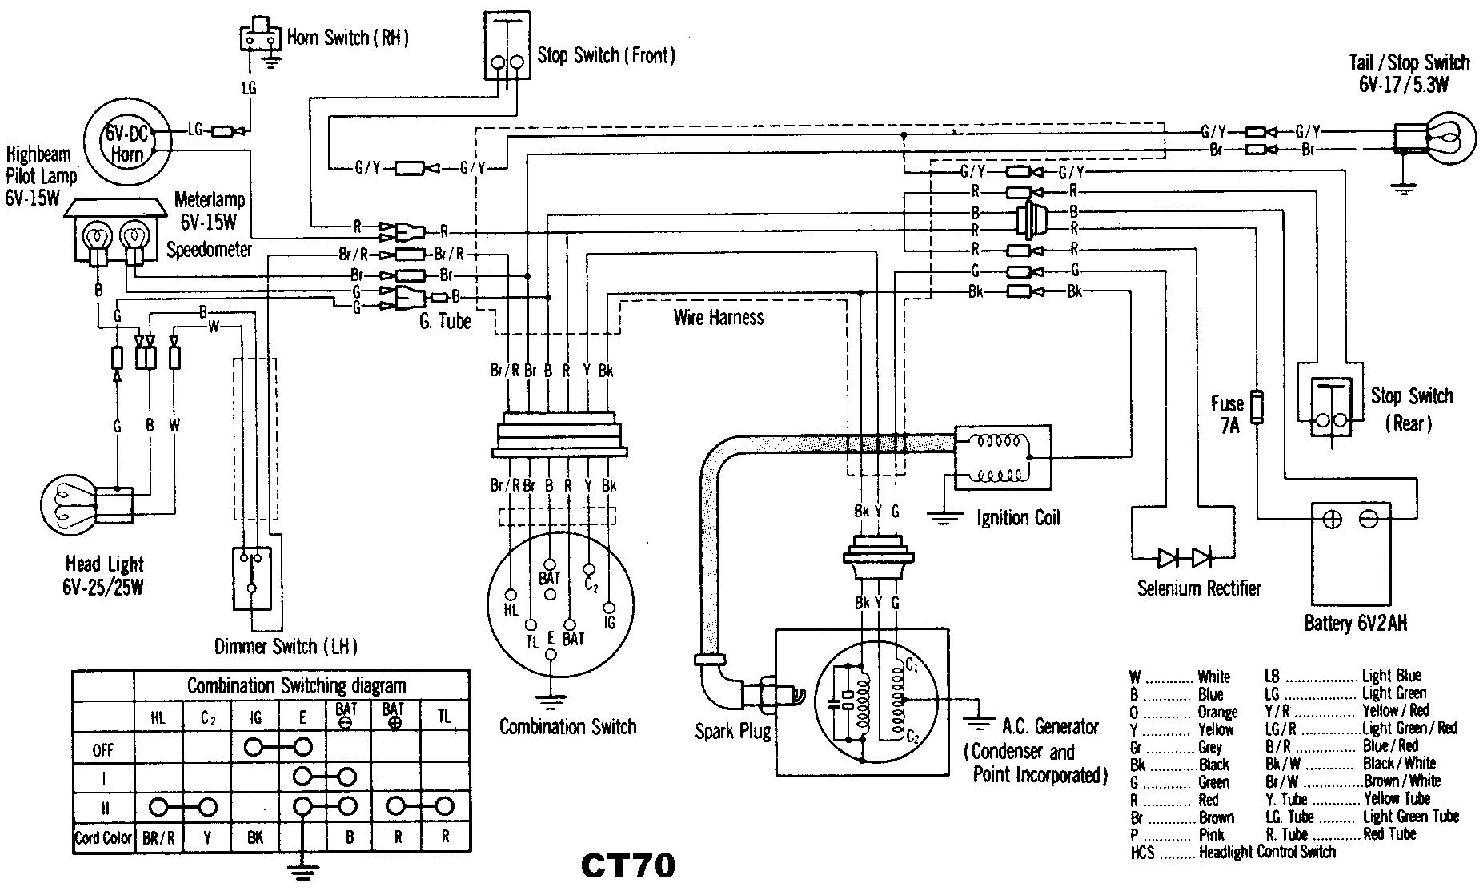 Gd 1416 Honda Cd125a Electrical Car Wiring Diagram Download Diagram